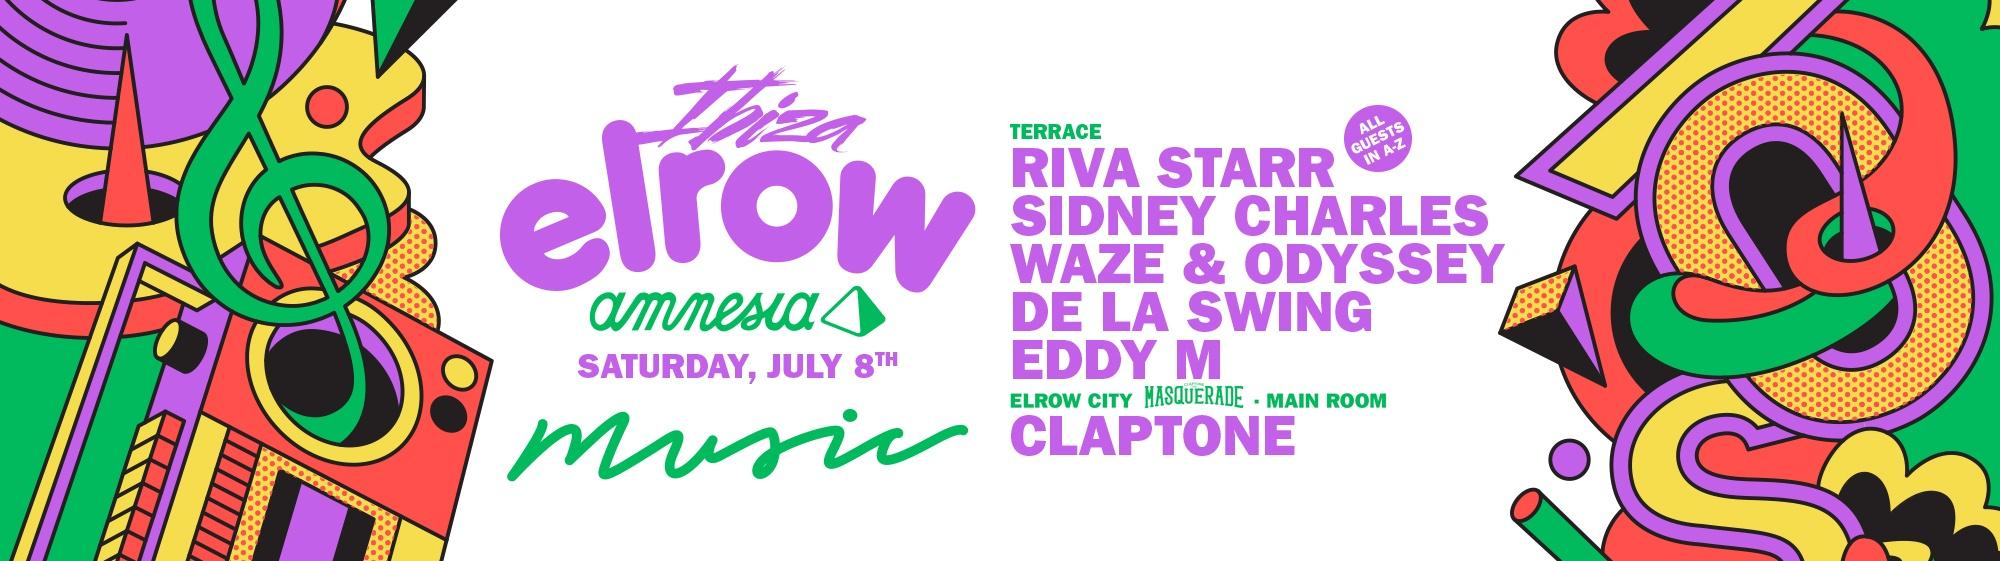 elrow Music 70's